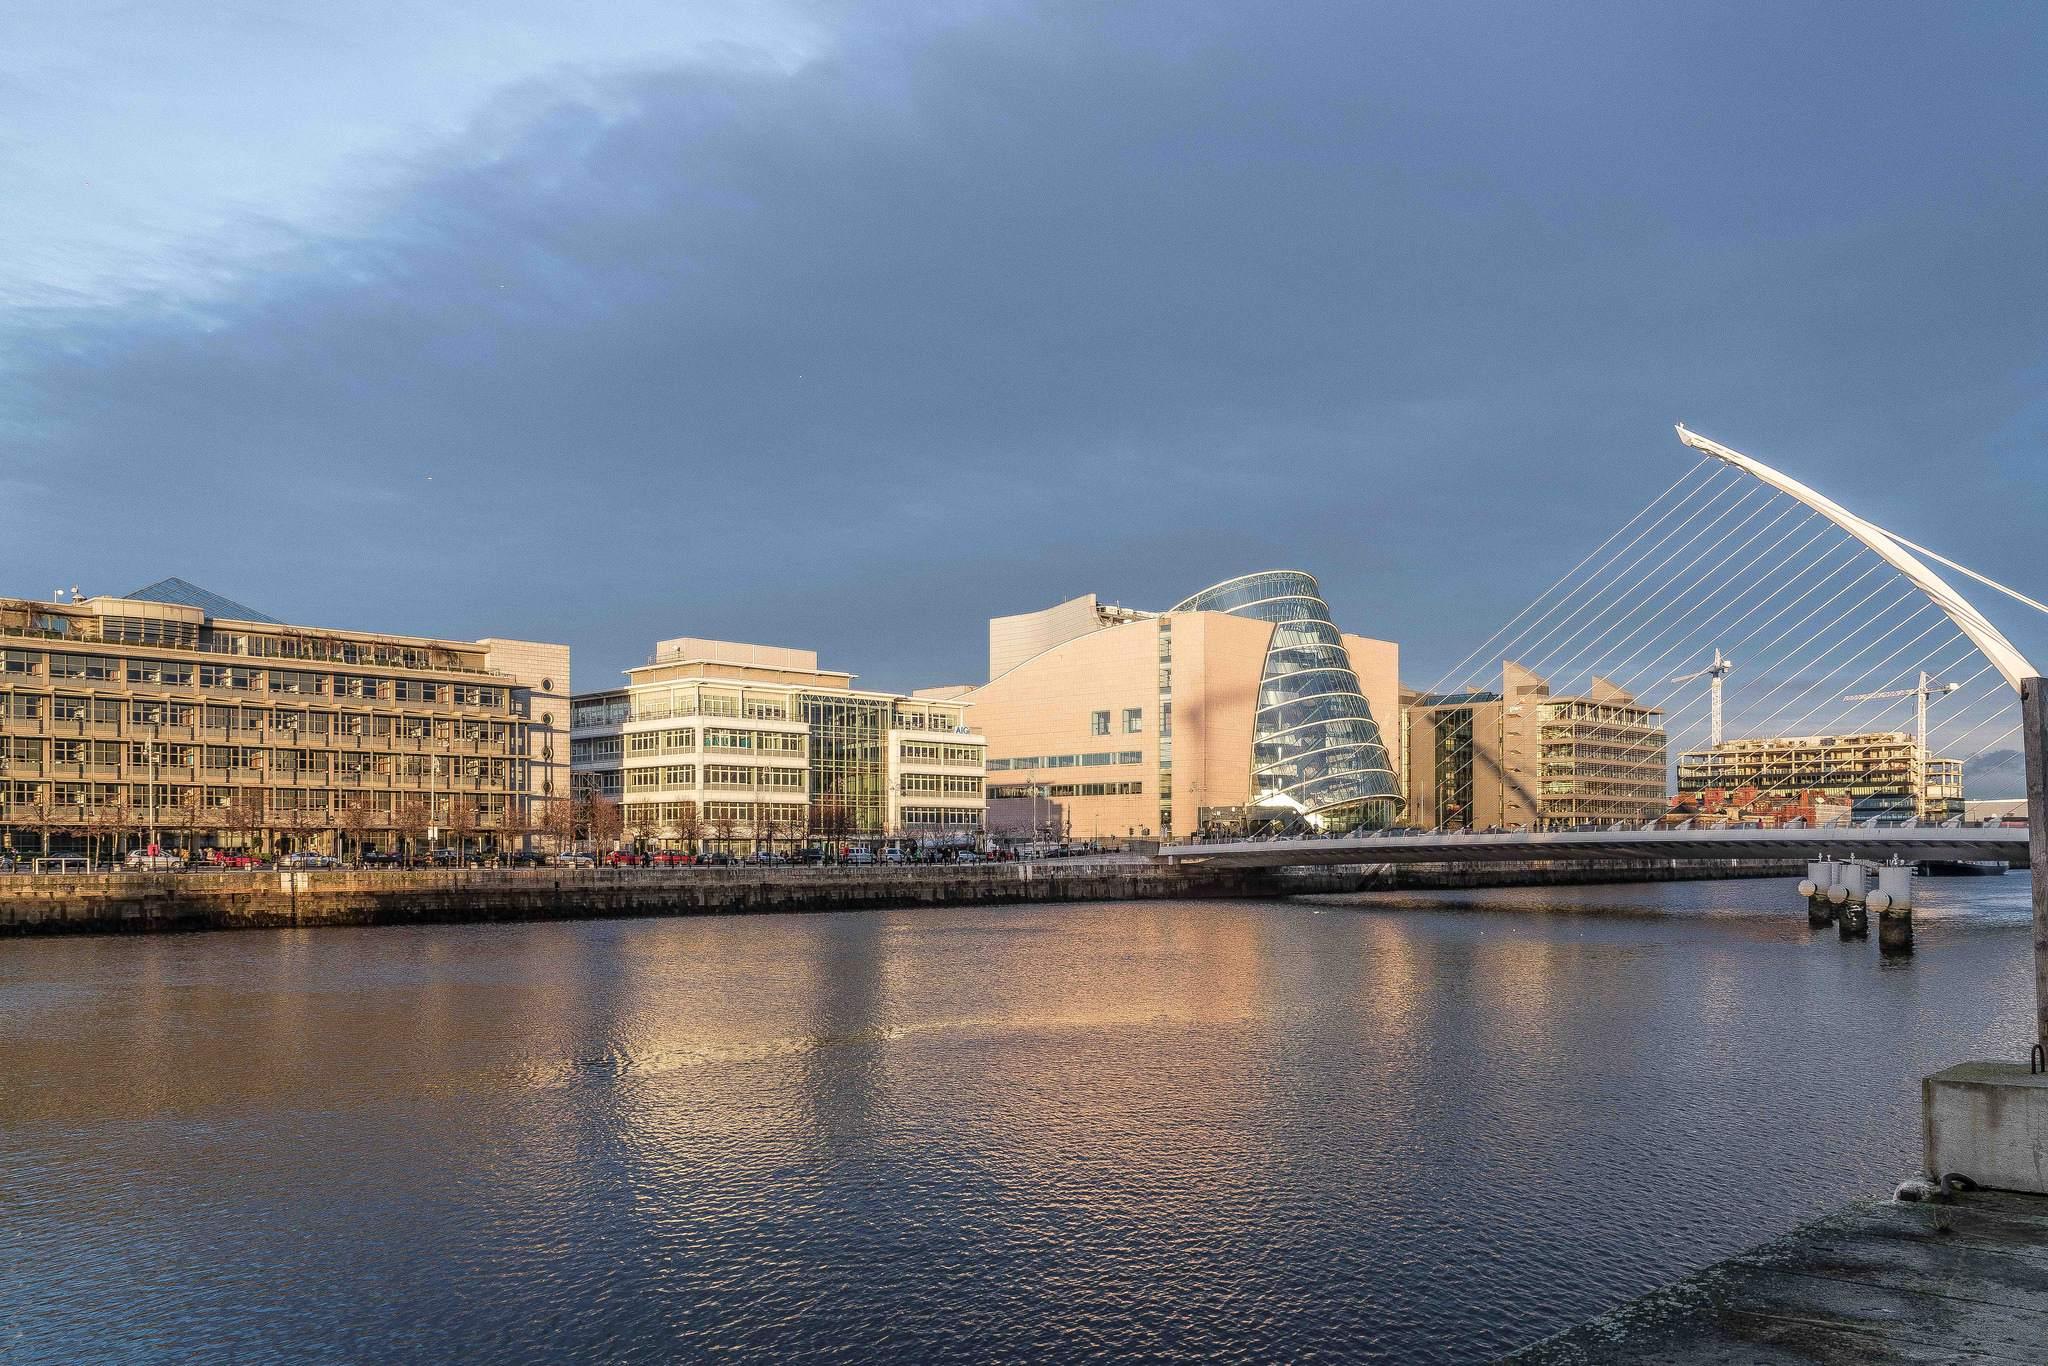 dublin docklands8 Walking Around Dublin Docklands by Marphy